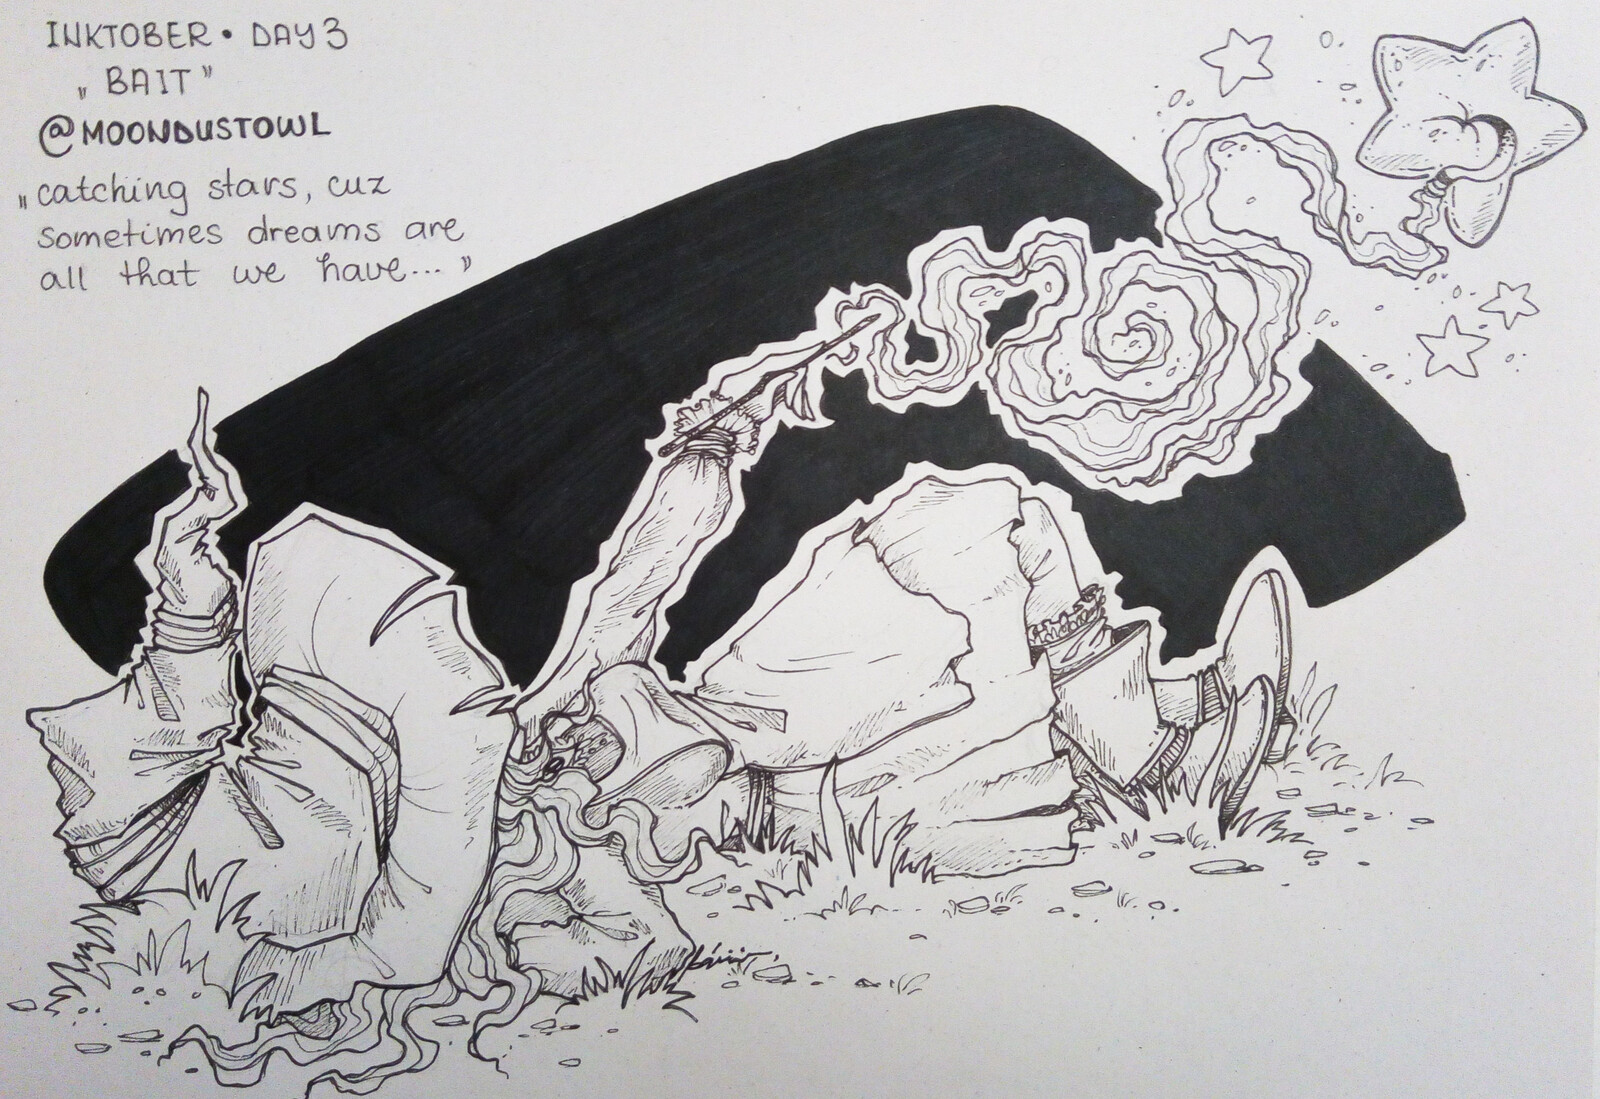 Day3 - Bait (catching stars)